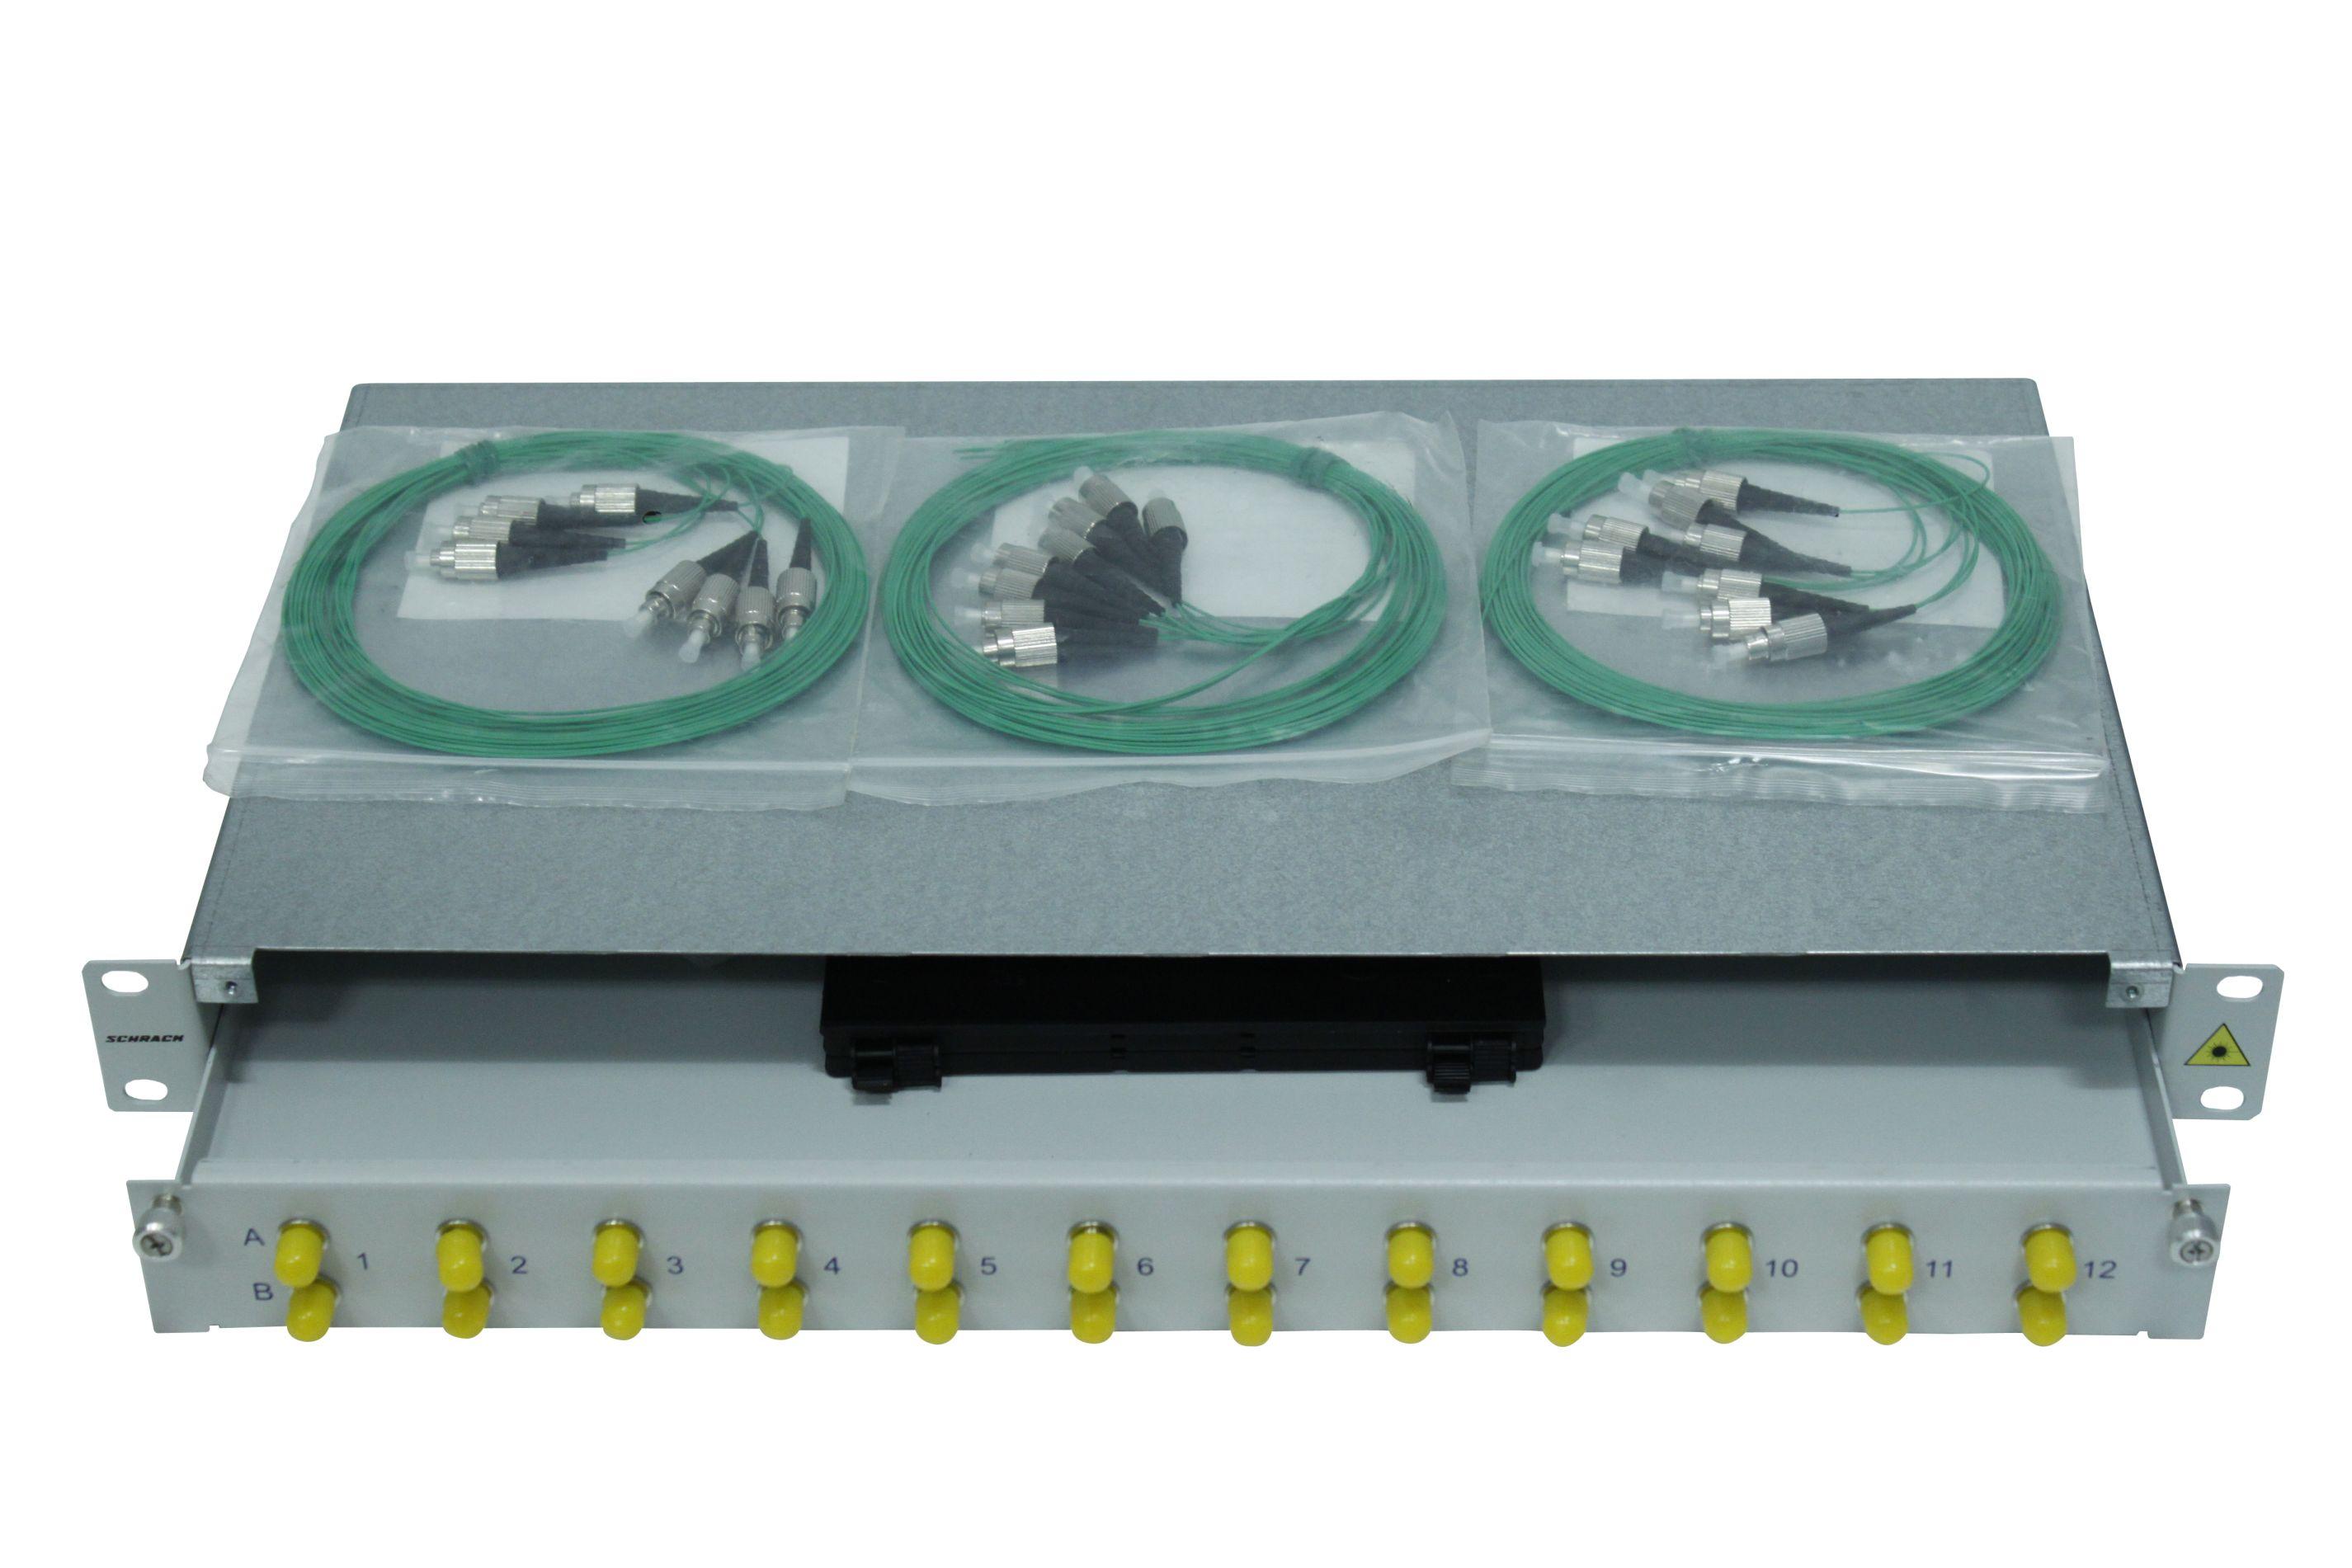 1 Stk LWL Spleißbox, 16Fasern, FC, 50/125µm OM2, 19, 1HE HSELS165FG